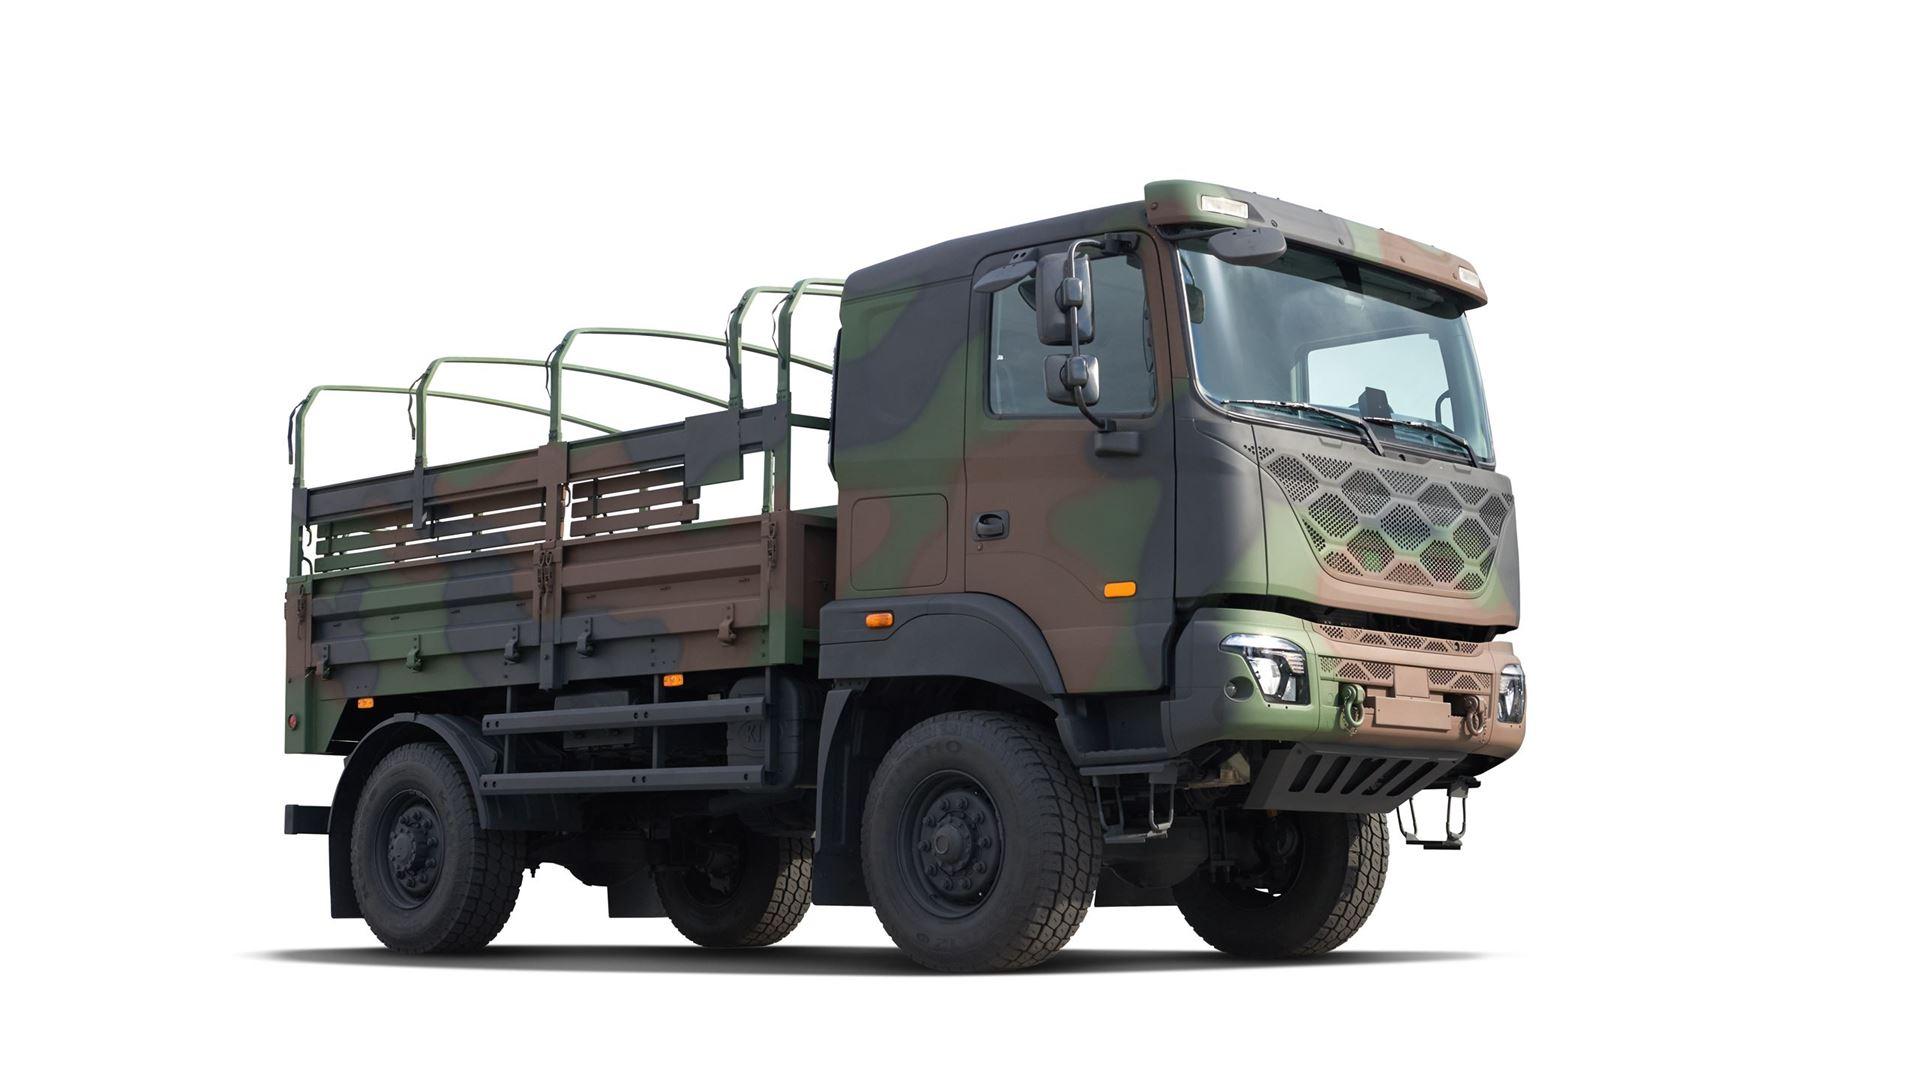 Kia Motors accelerates development of combat vehicles with new military standard platform - Image 2